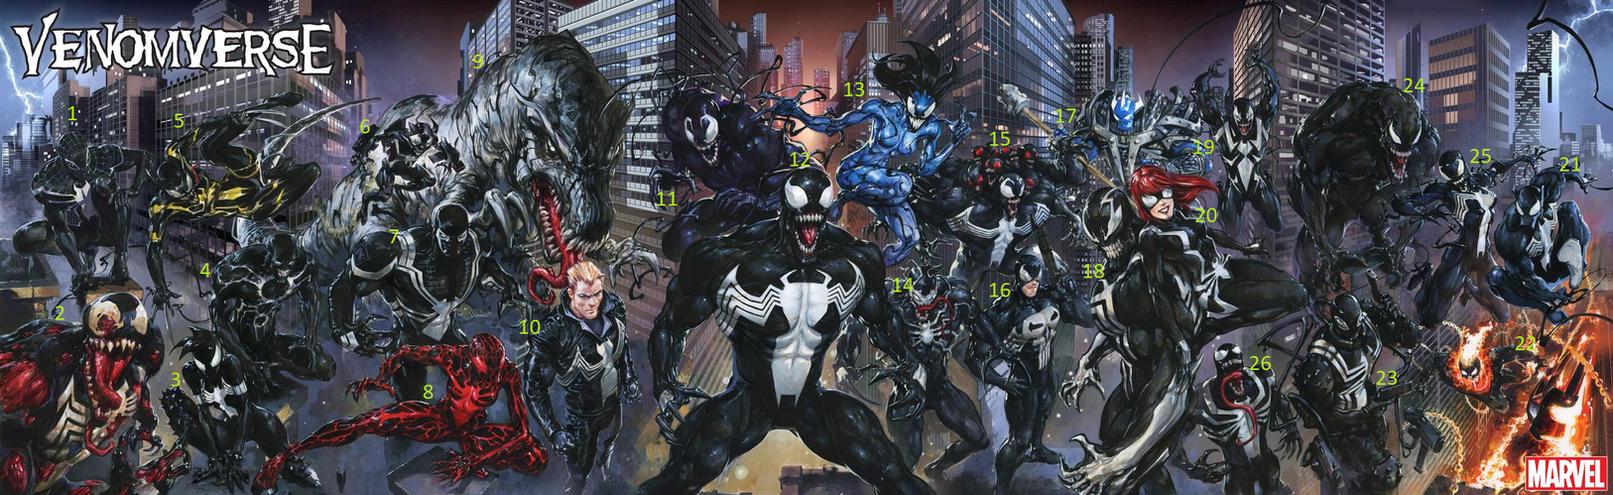 Venomverse by marhawkman